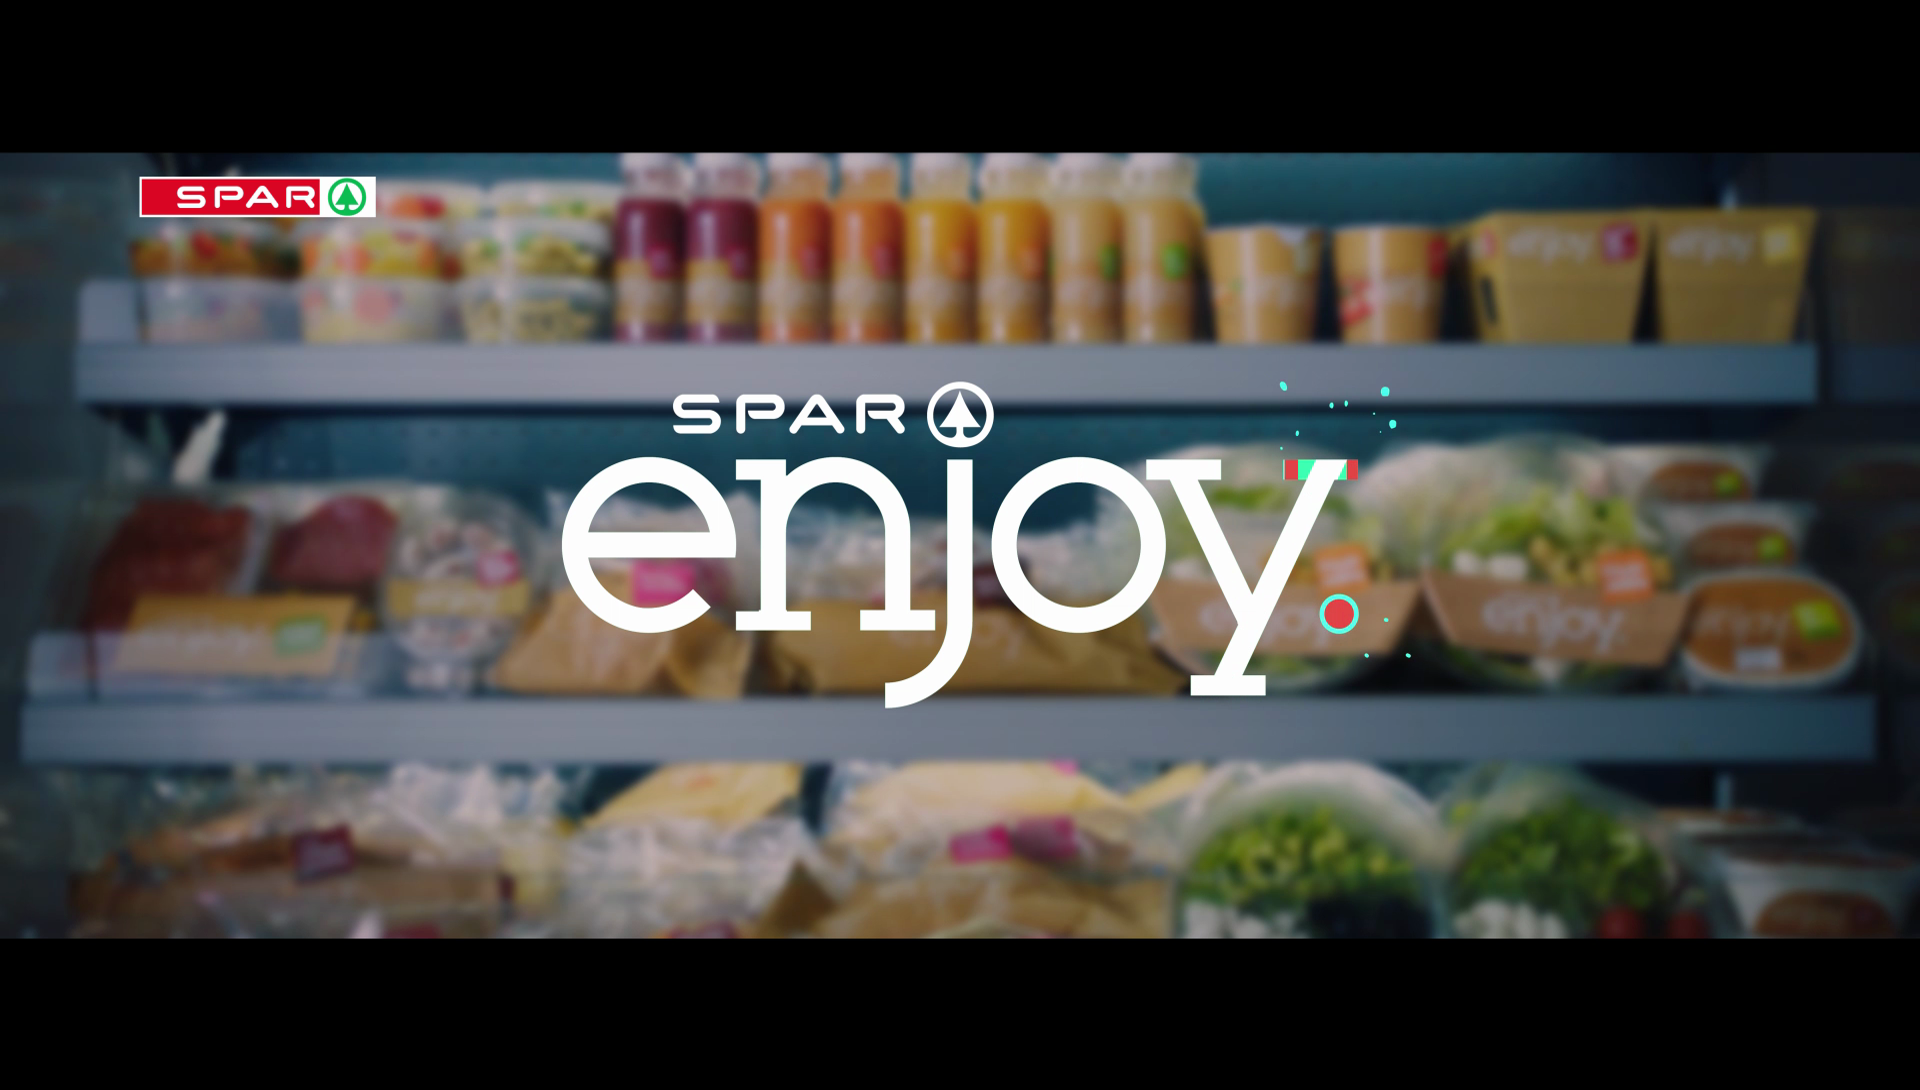 SPAR Enjoy